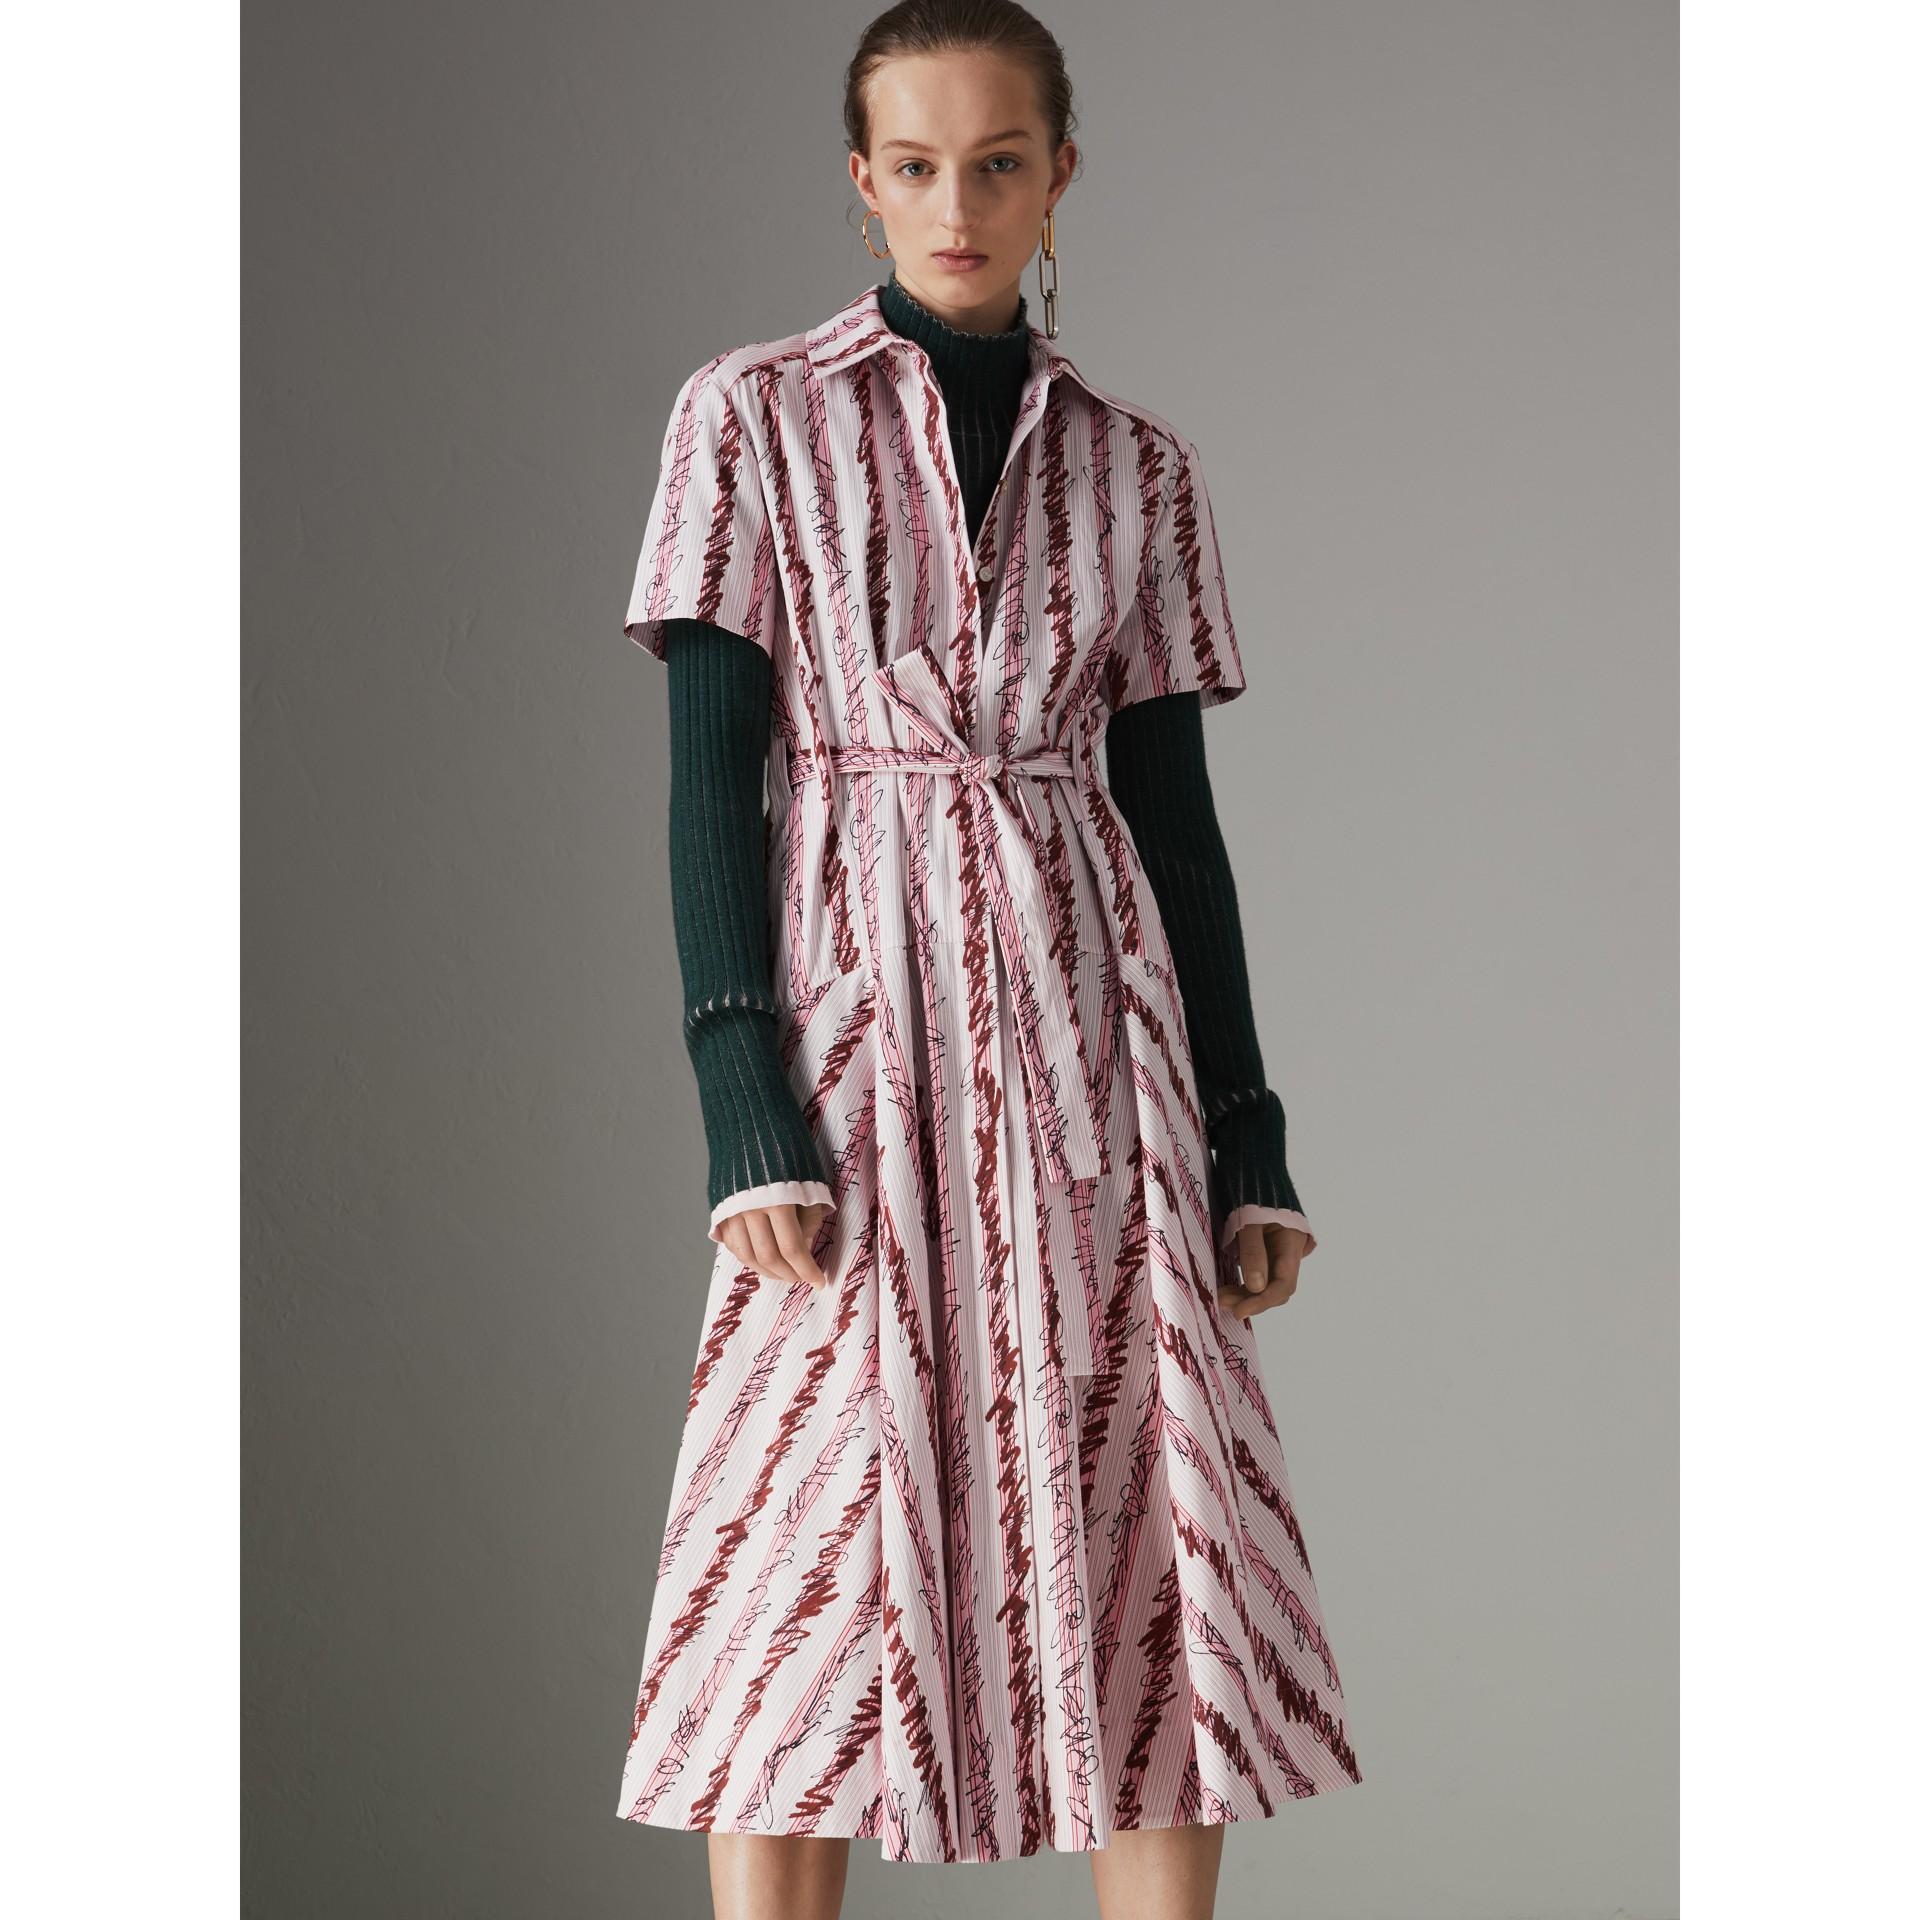 Scribble Stripe Cotton Shirt Dress in Light Pink - Women | Burberry United Kingdom - gallery image 5